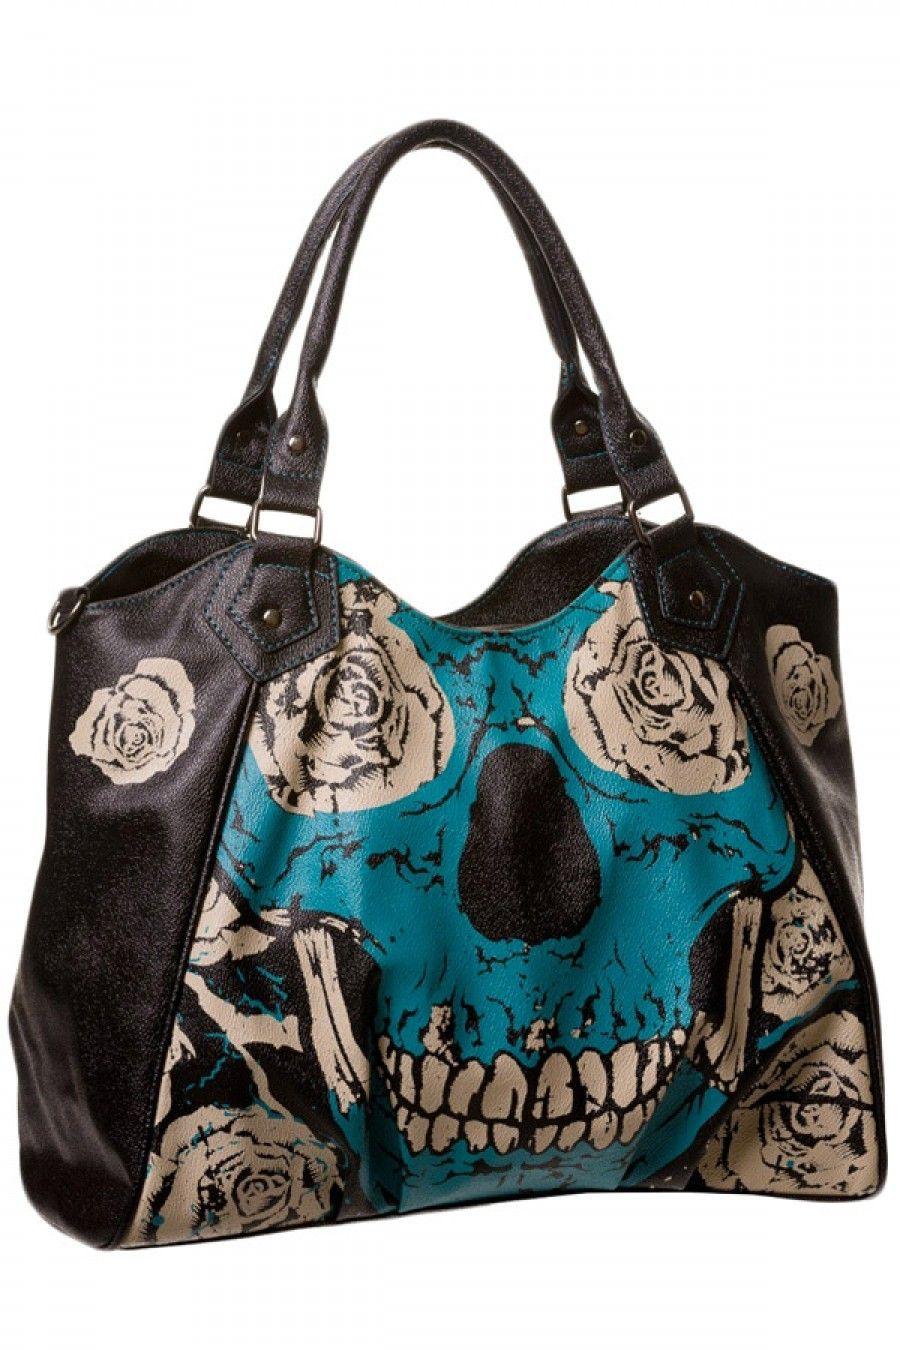 31536c9c0d55 Blue Skull Handbag - let me love you.